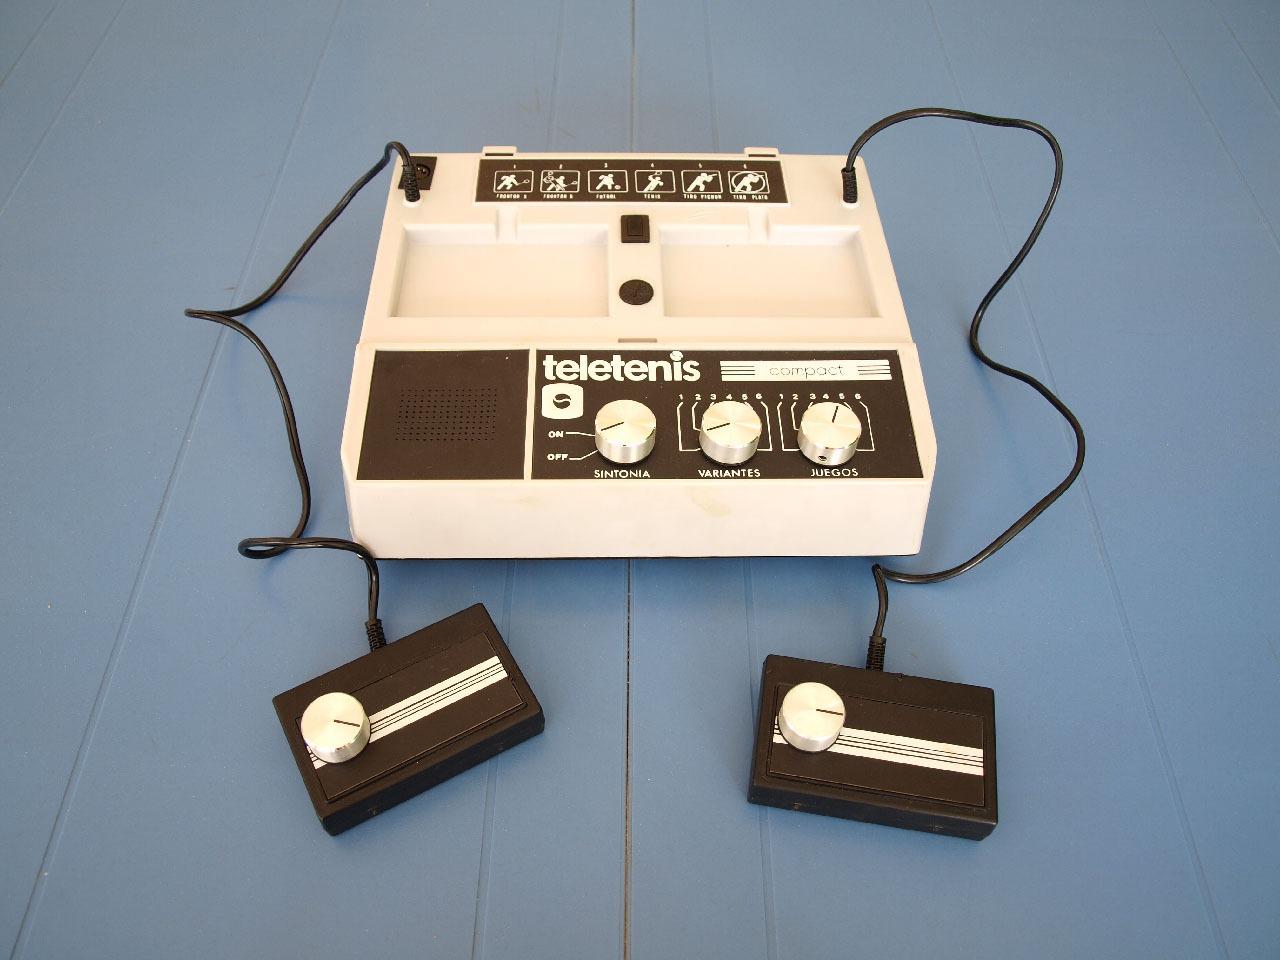 Teletenis Compact, retrounboxing y gameplay 5